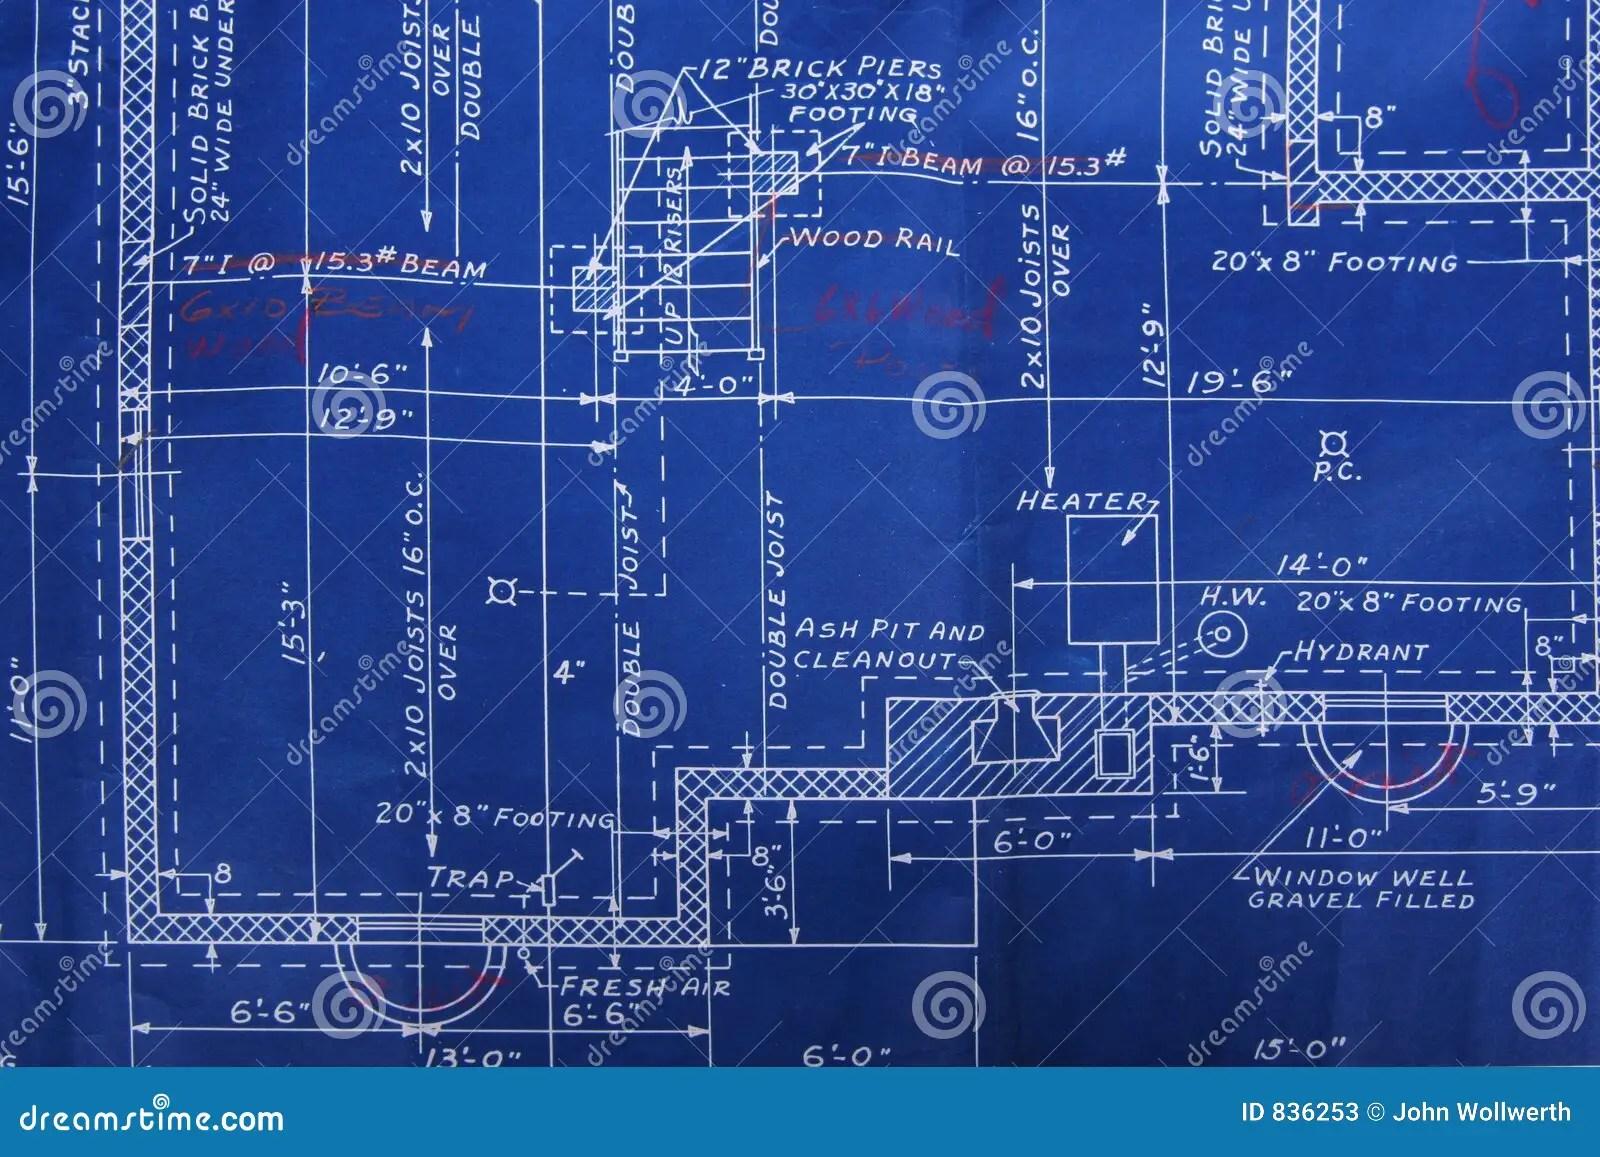 Cmyk Wallpaper Hd Blueprint Detail Stock Photos Image 836253